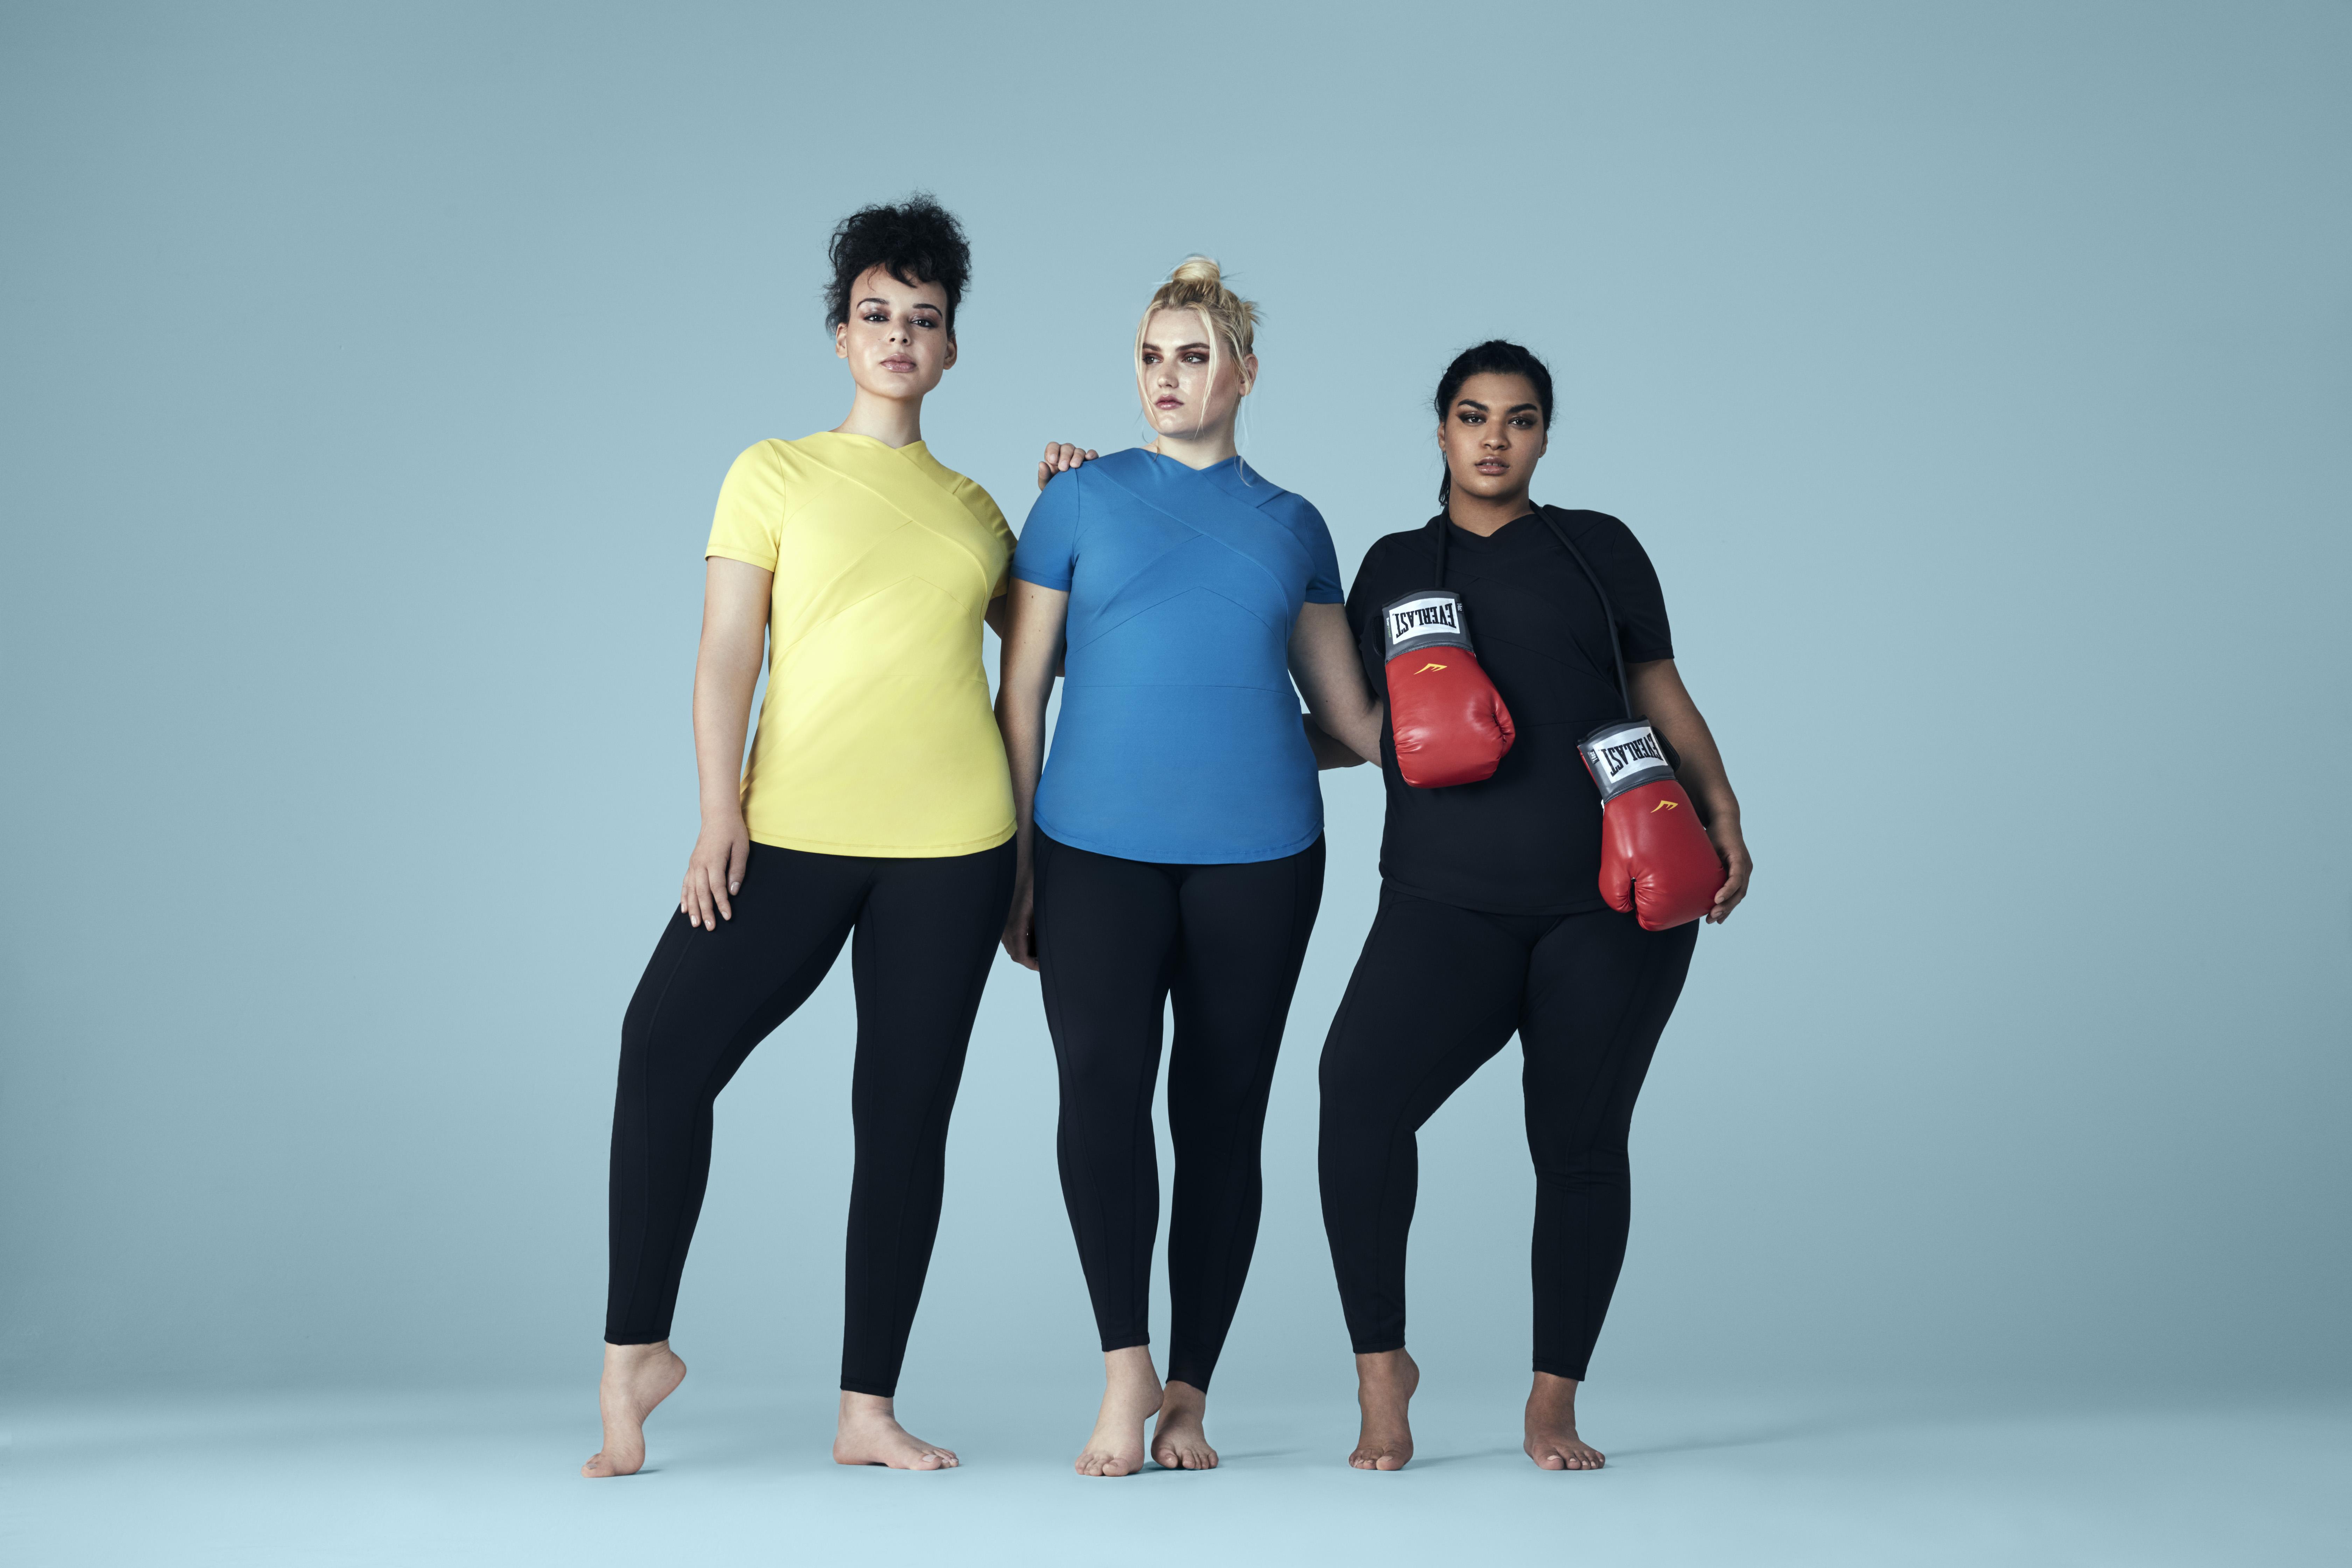 Activewear Brands Are Ignoring Plus-Size Women